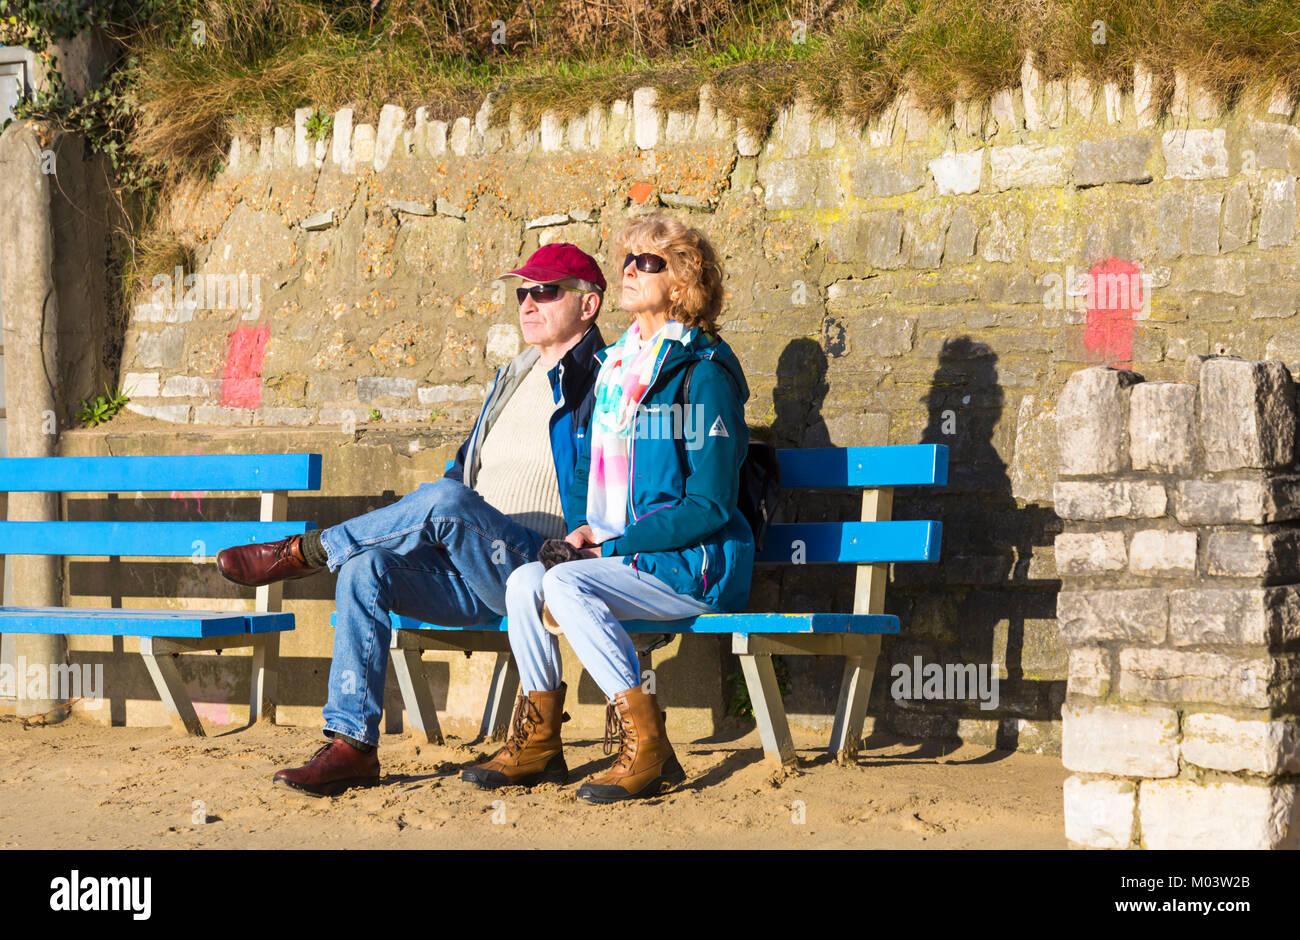 Bournemouth, Dorset, UK. 18th Jan, 2018. UK weather: a lovely sunny day at Bournemouth beach. Couple enjoy the sunshine Stock Photo